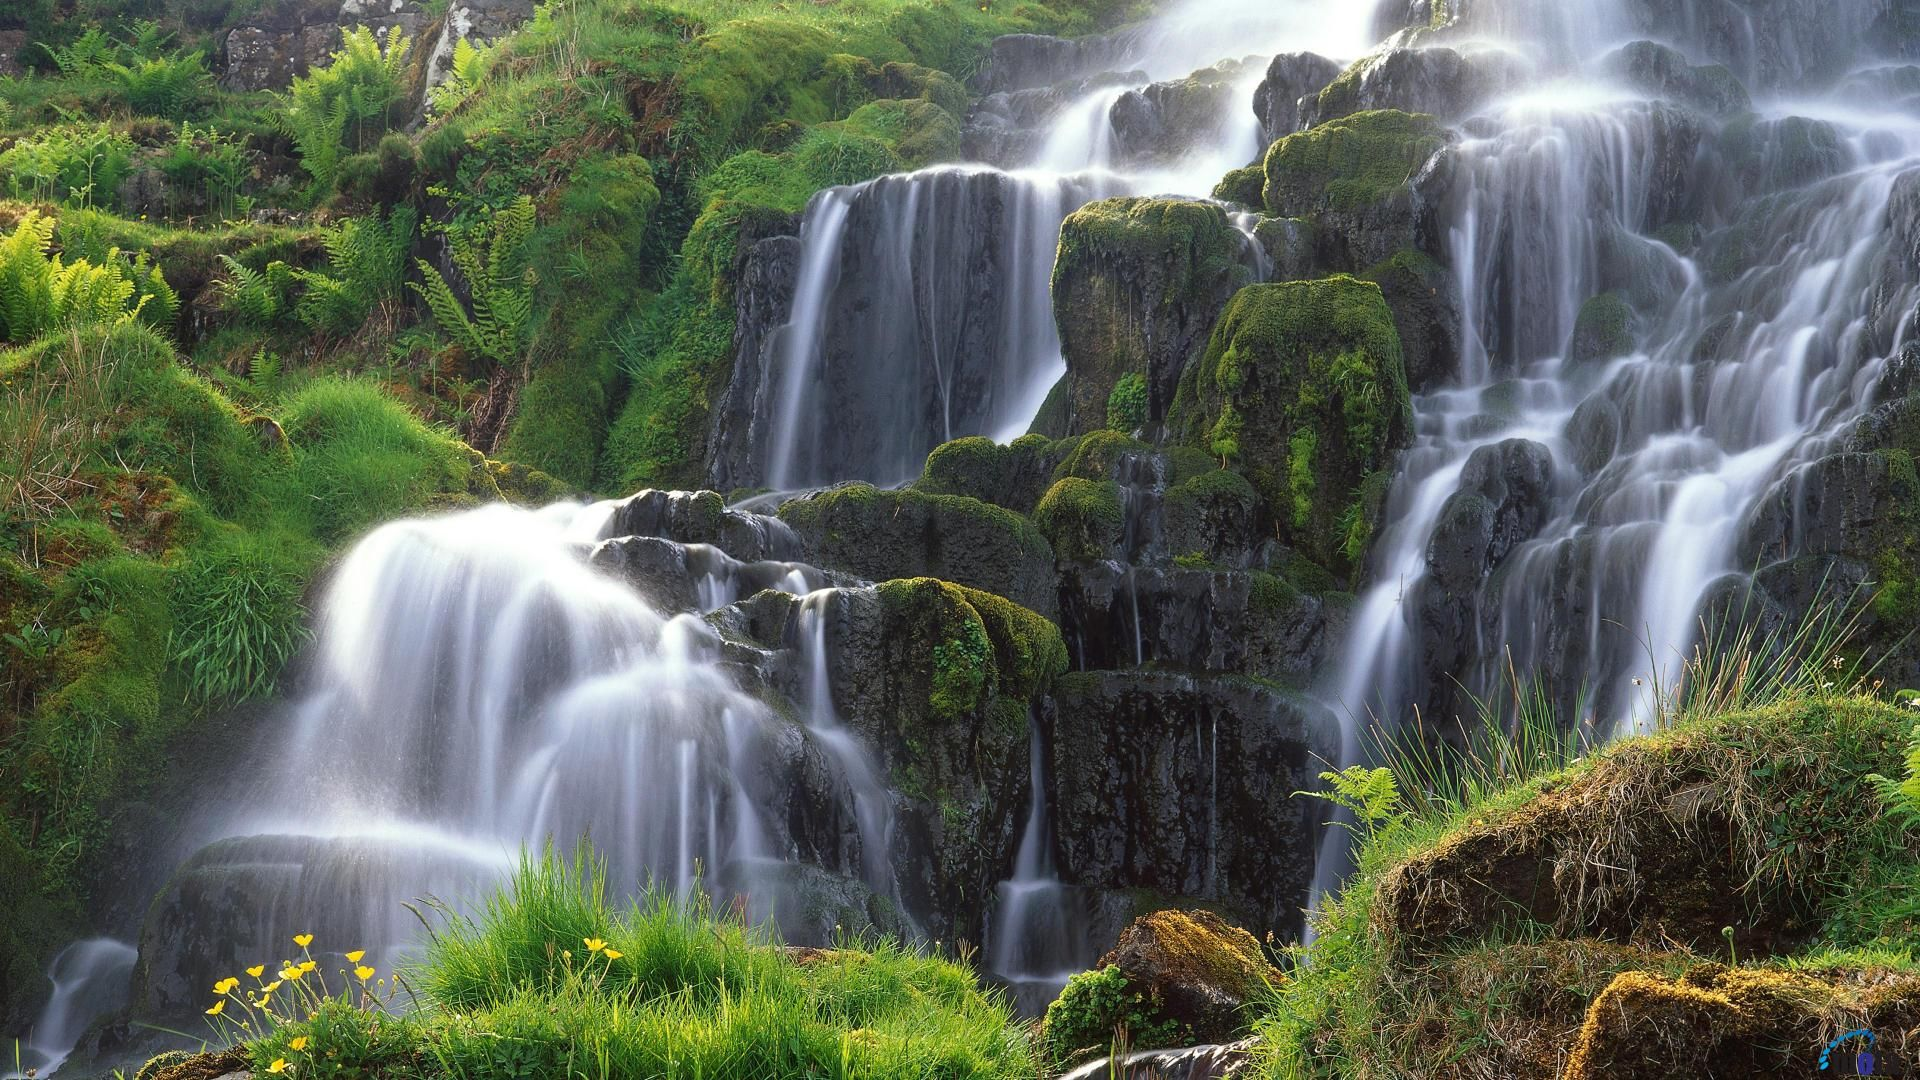 Hd Waterfall Wallpapers 1080p